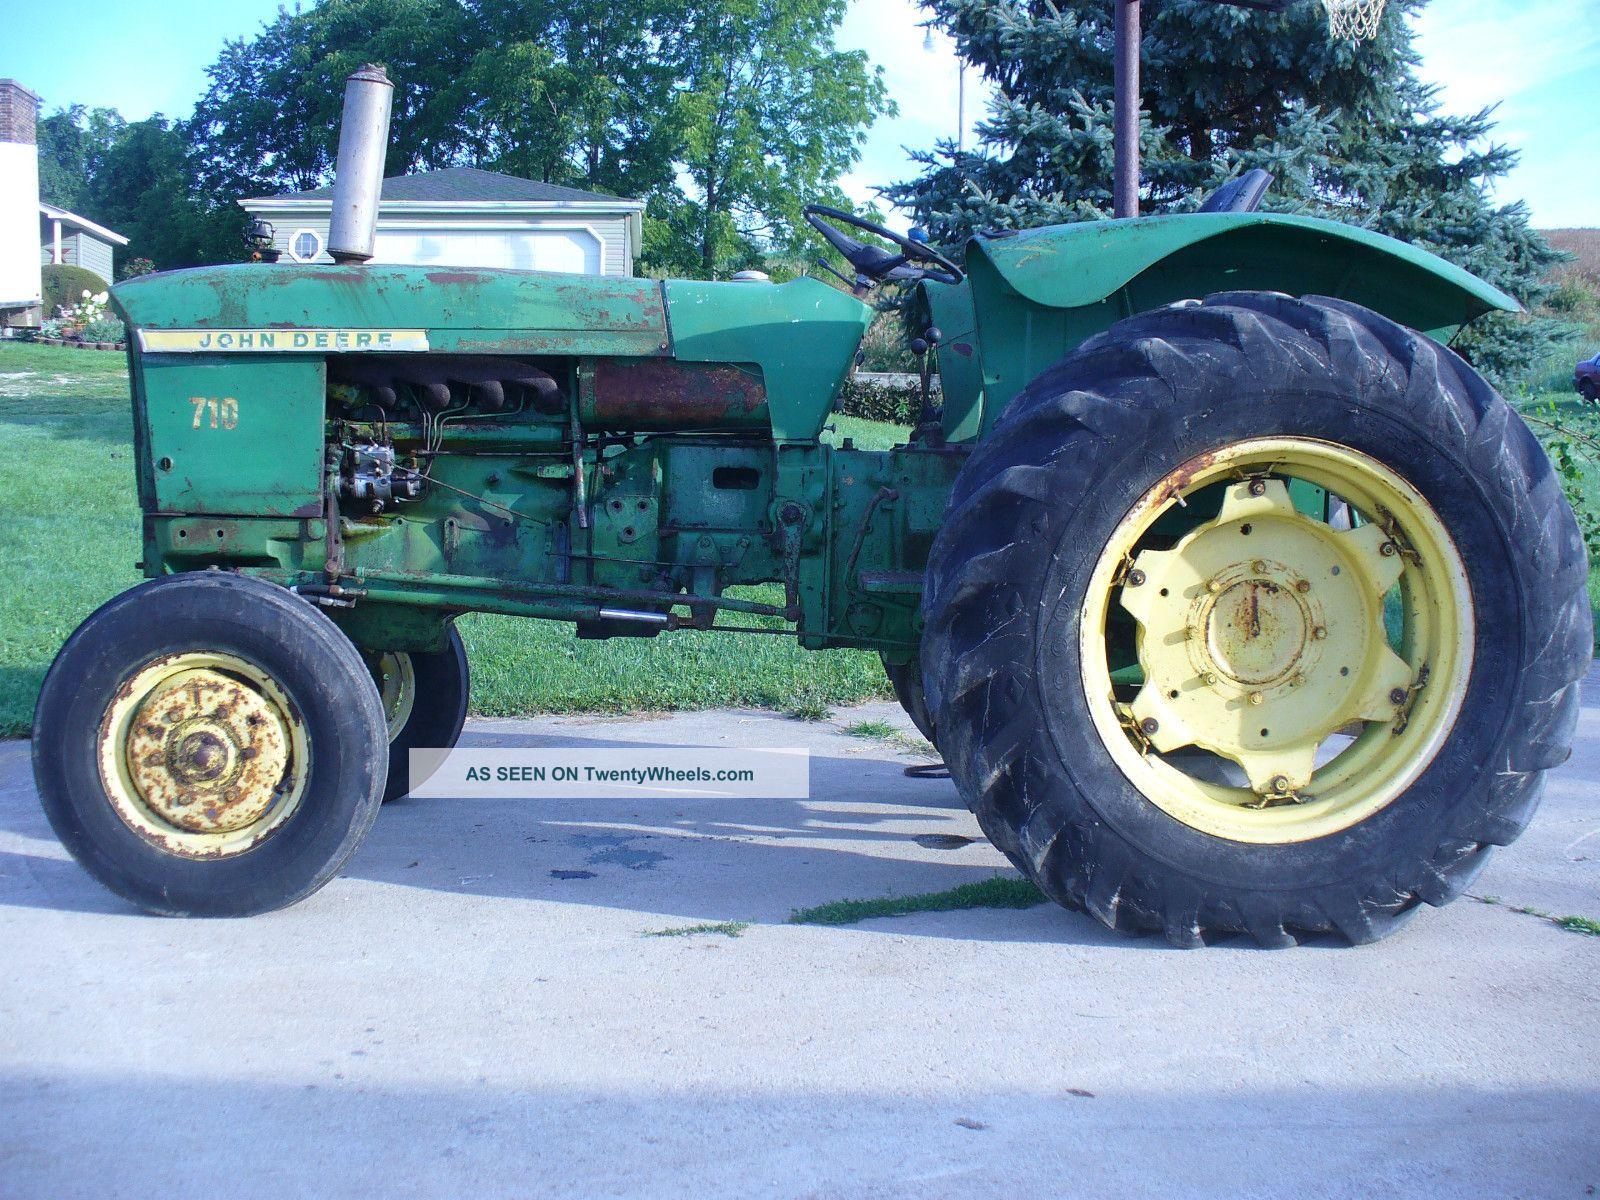 Rare John Deere Tractors : Rare john deere diesel tractor